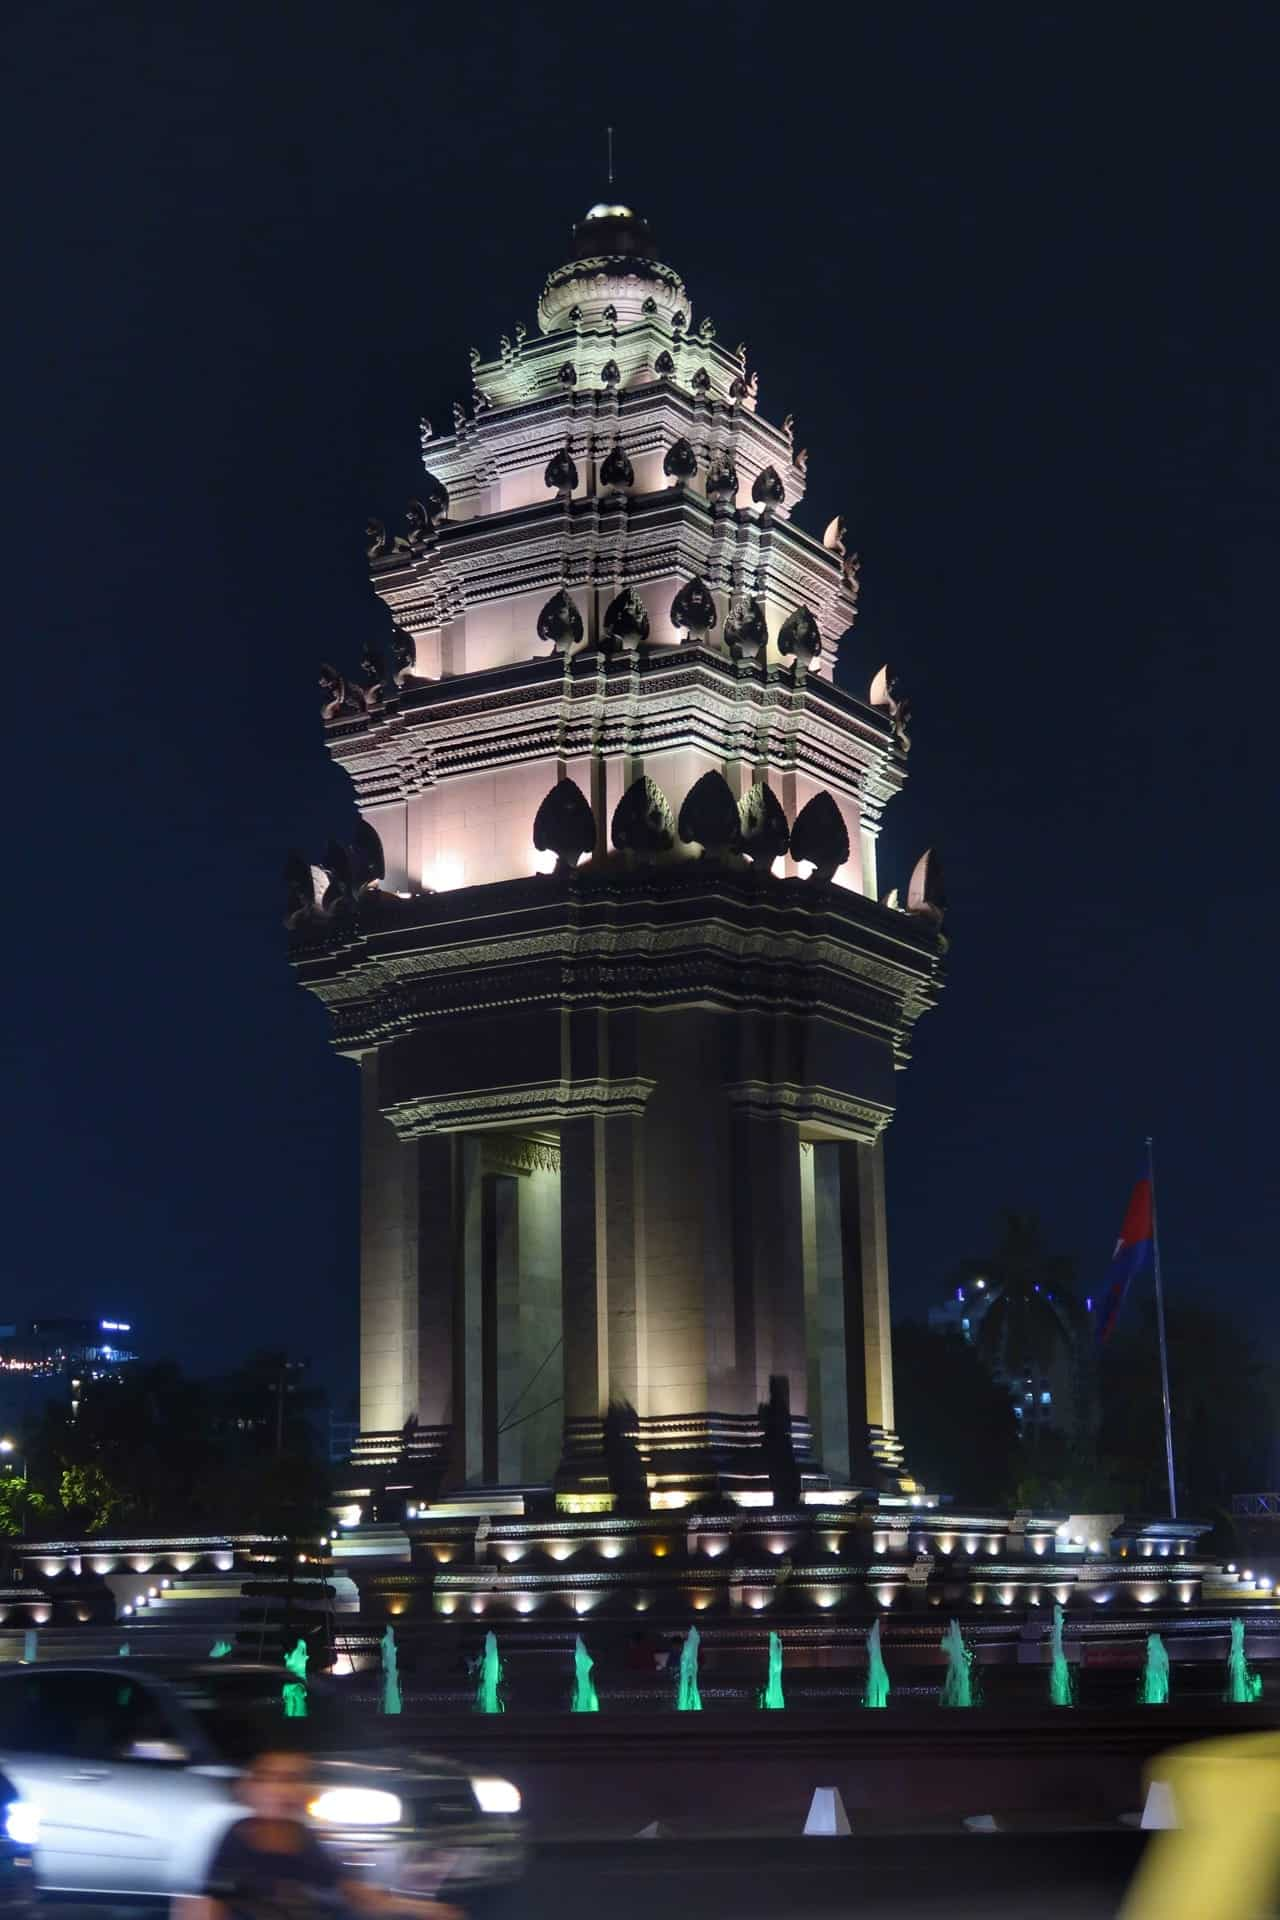 Uafhængigsmonument i Phnom Penh